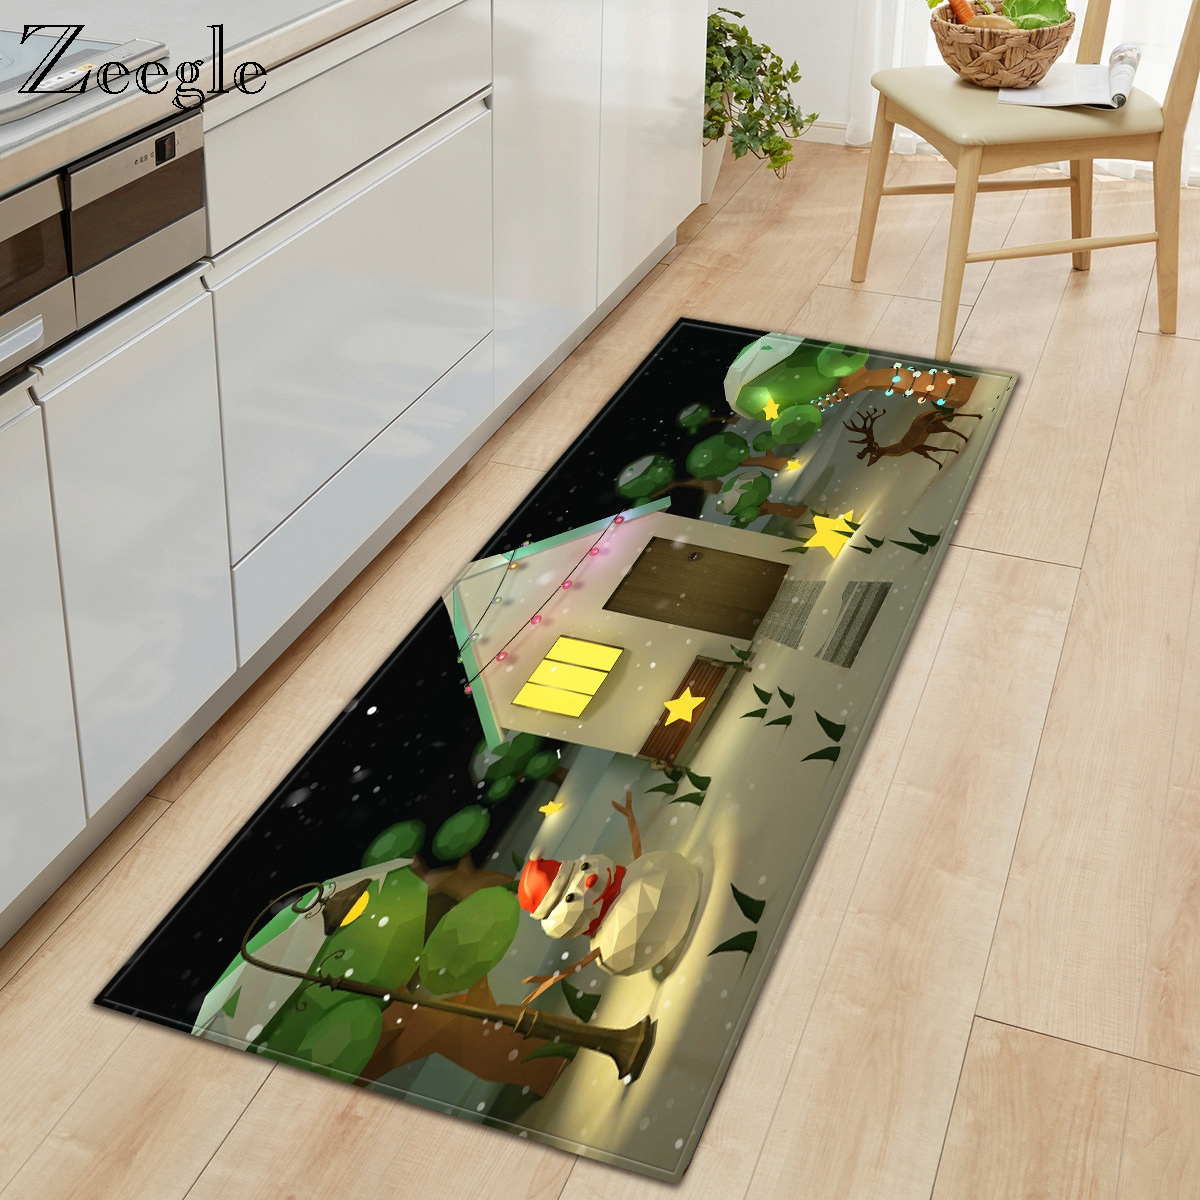 Cartoon Carpet Anti-slip Kitchen Carpet Bathroom Doormat Shower Floor Mat Bedside Rug Mat Rugs and Carpets for Home Living Room